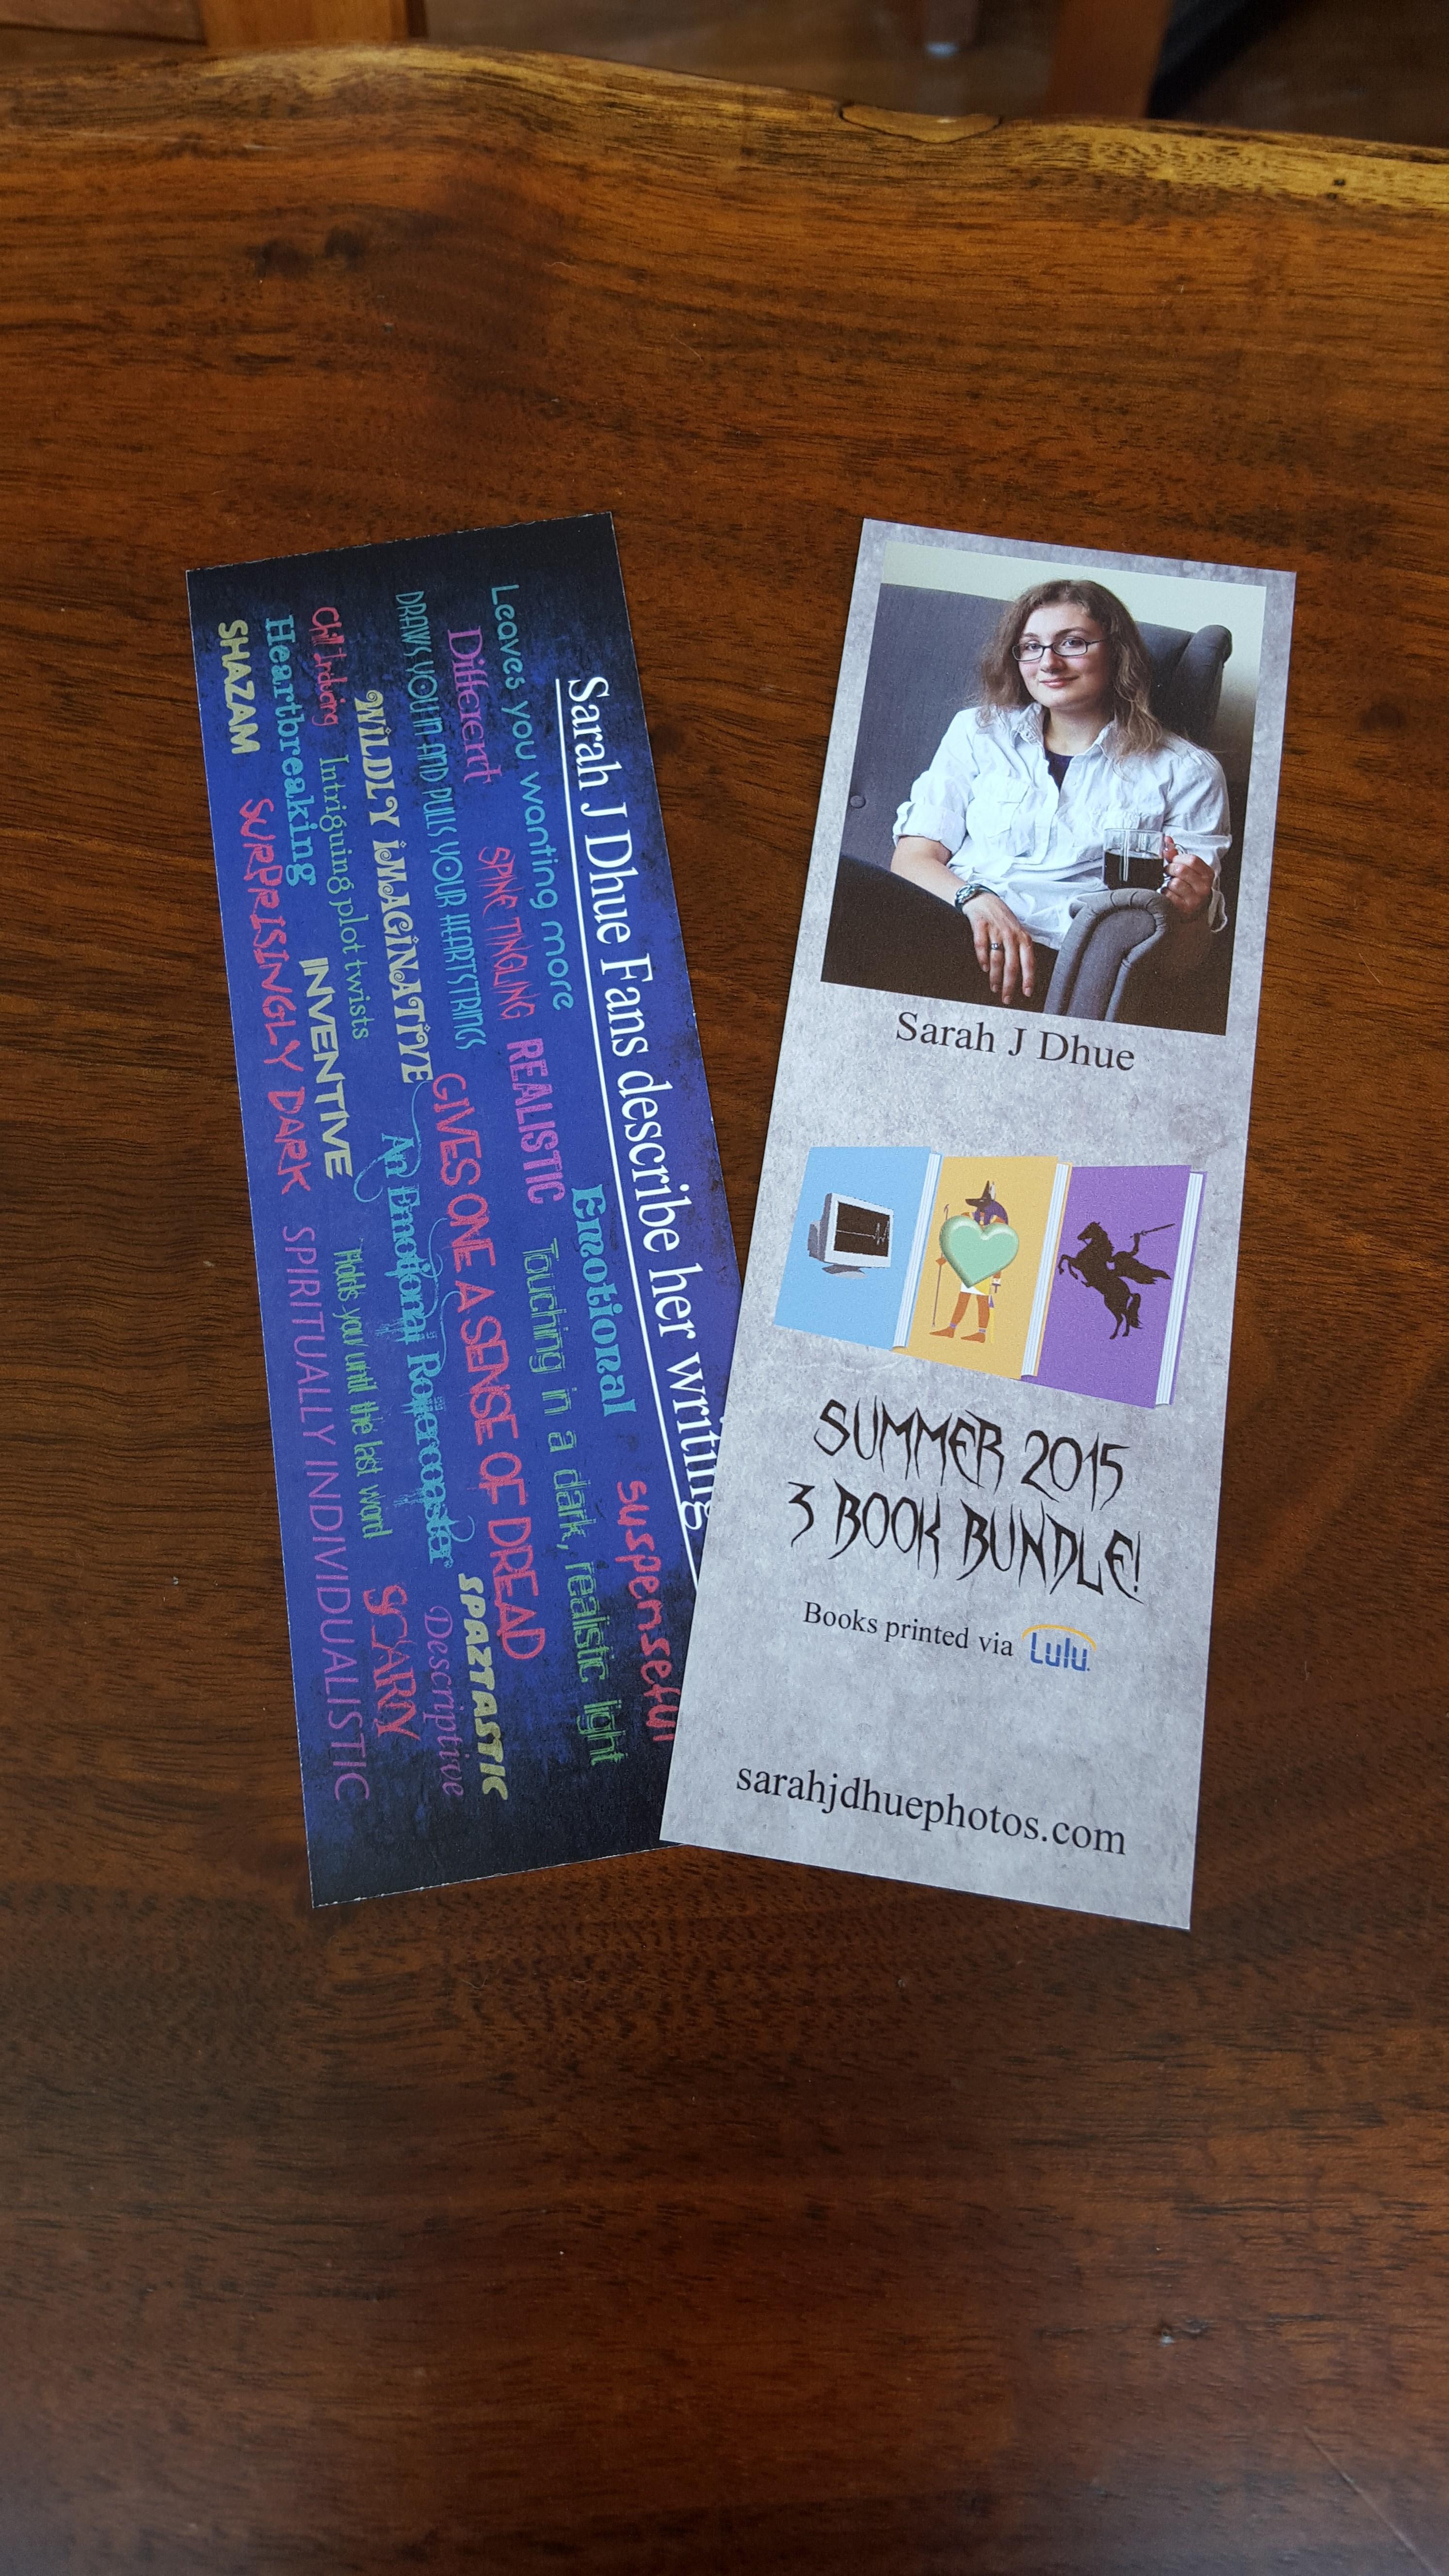 2015 Book Bundle Bookmarks